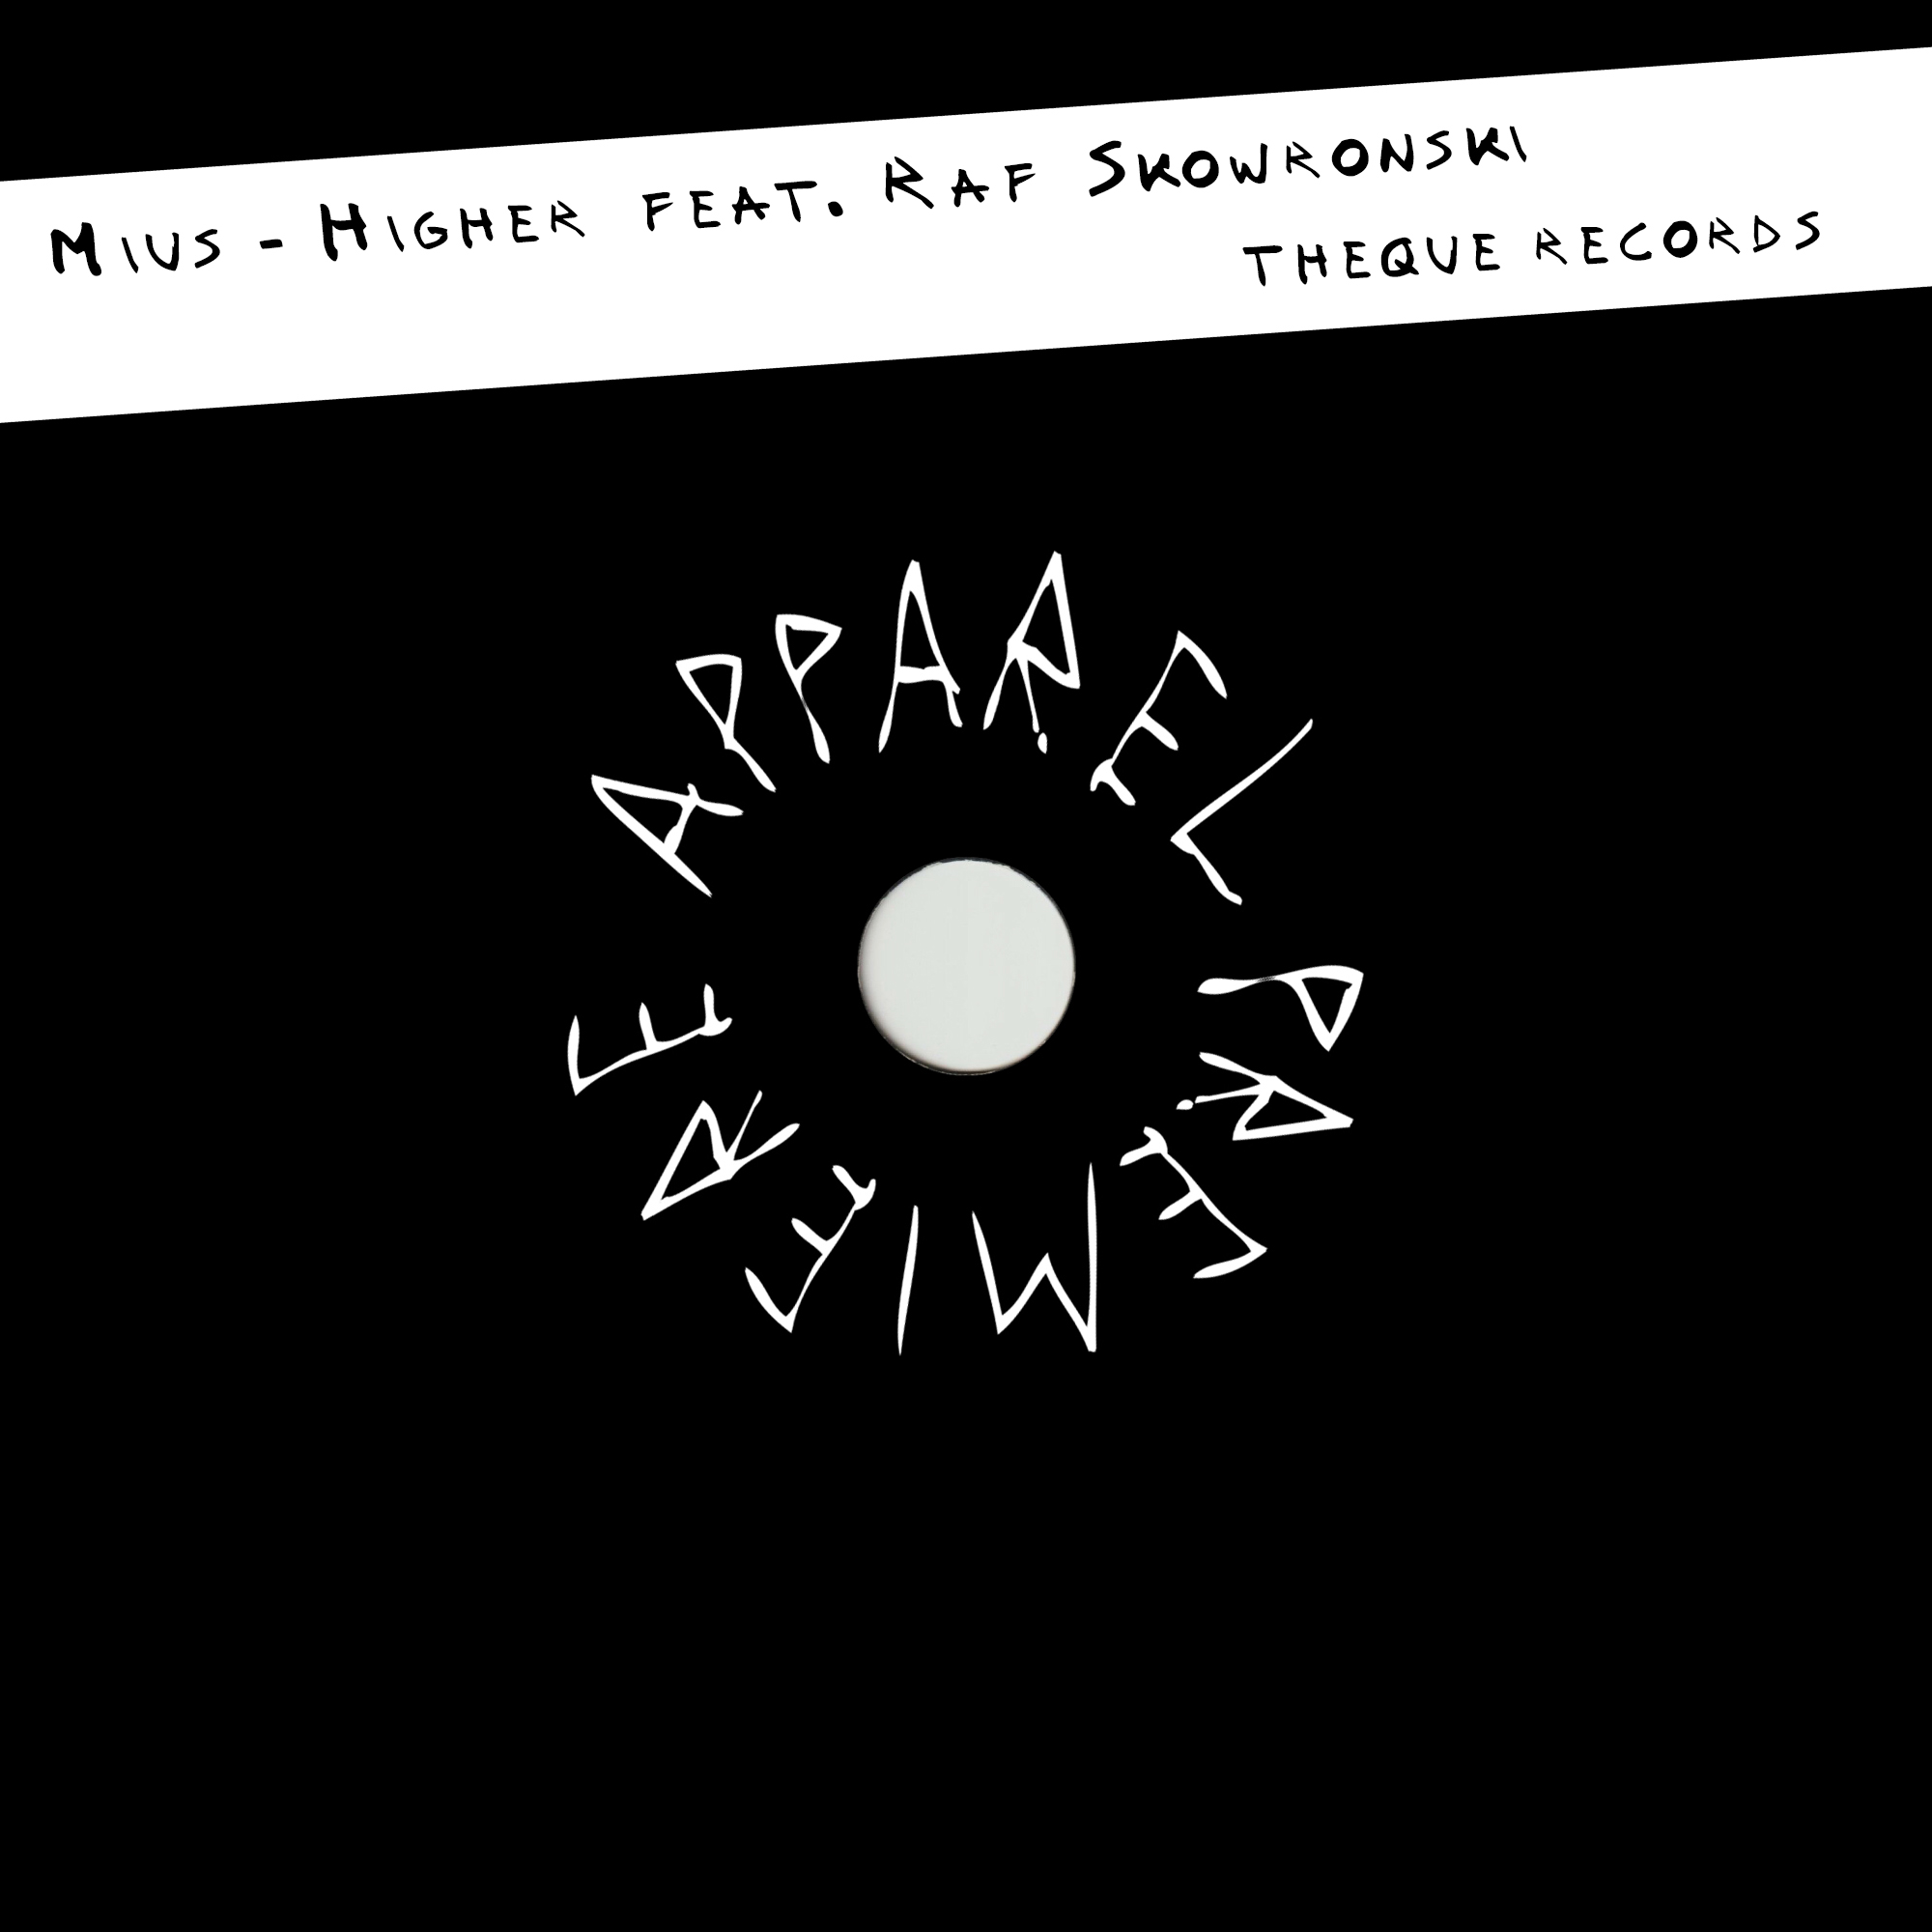 APPAREL PREMIERE Mius – Higher feat Raf Skowronski [Theque Records]